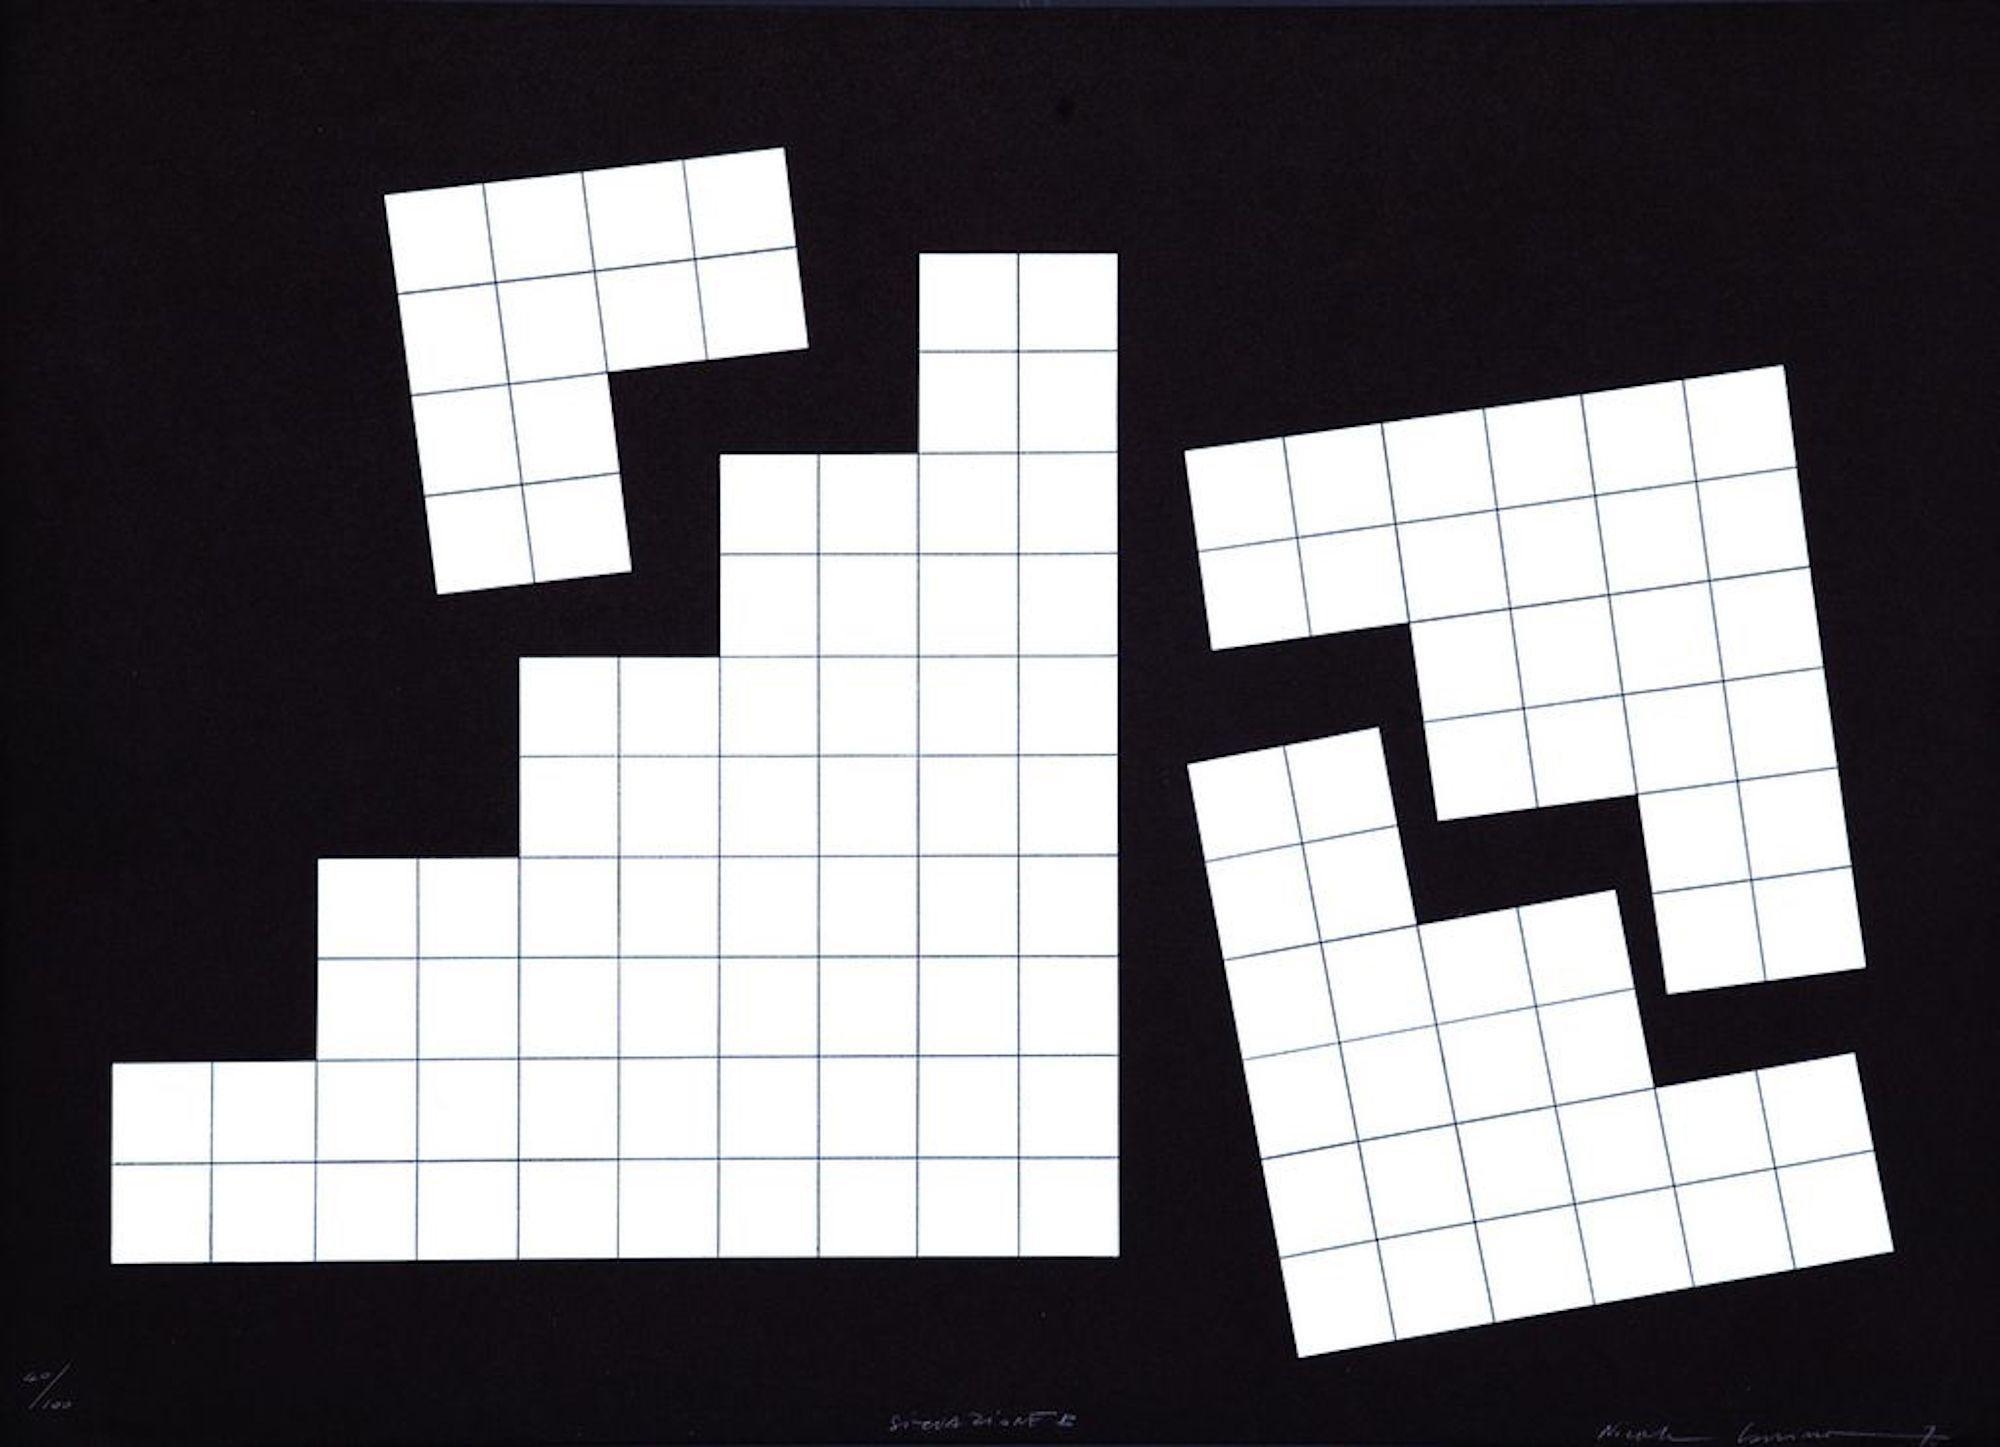 Situation B - Original Screen Print by Nicola Carrino - 1970s